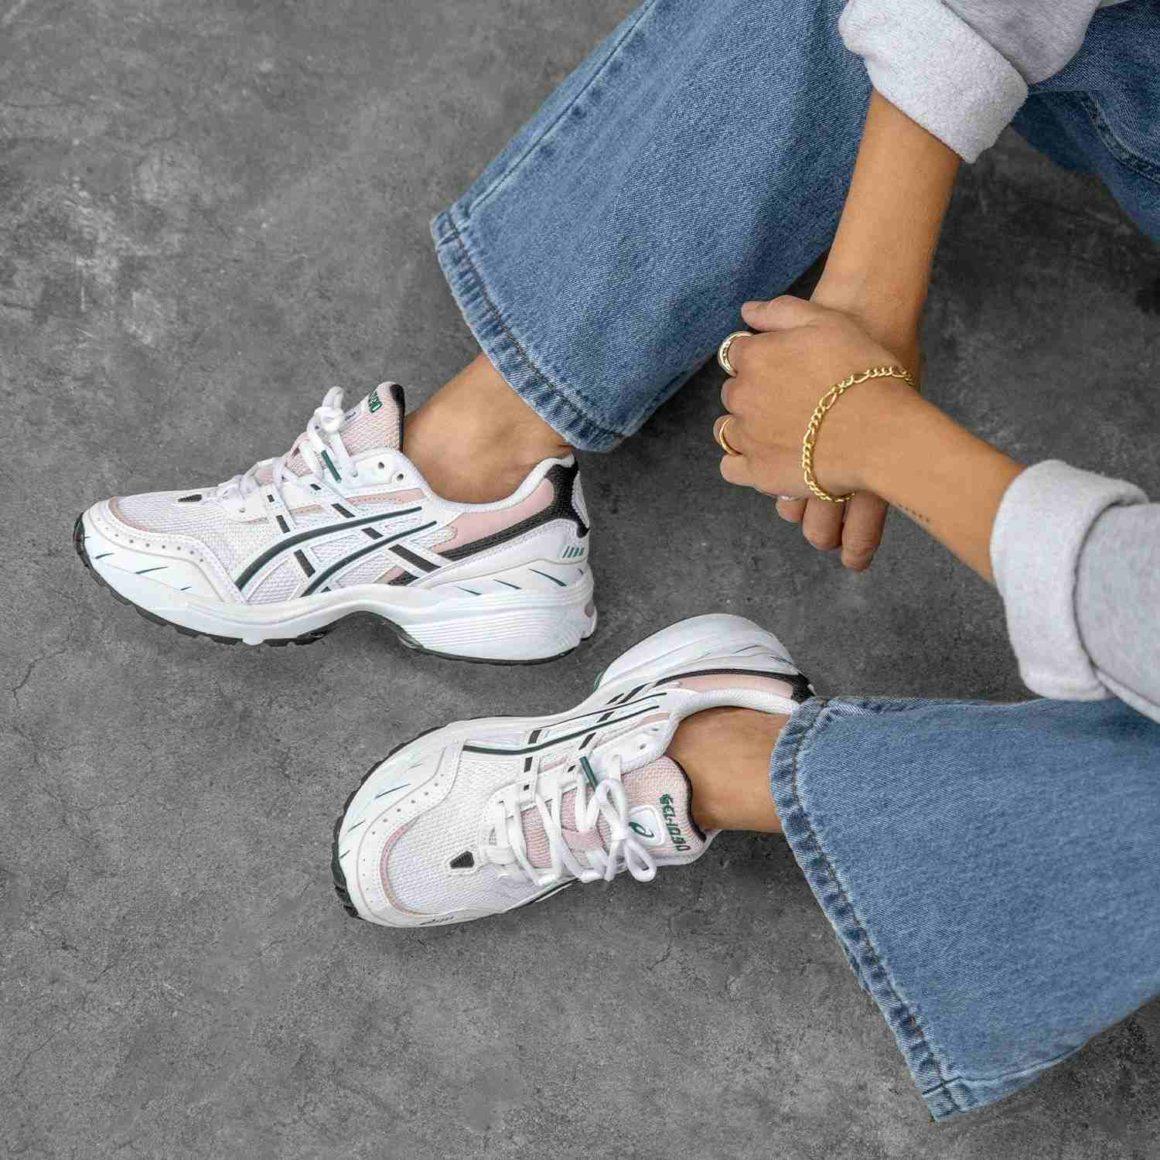 Running Styles Sneaker Trends 2021